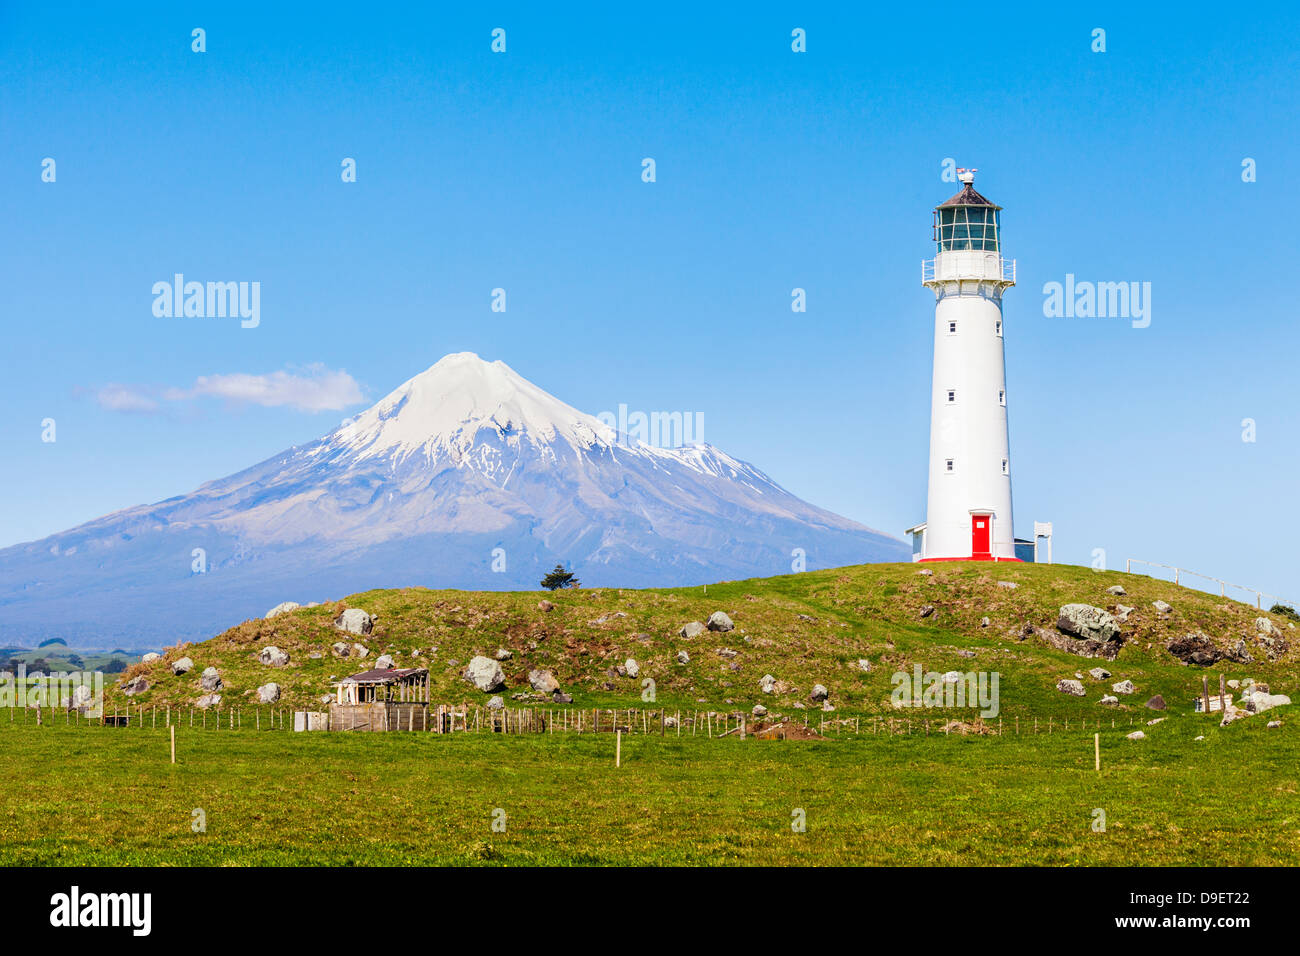 Cape Egmont Lighthouse and Taranaki/Mount Egmont, in the Taranaki Region of New Zealand Stock Photo